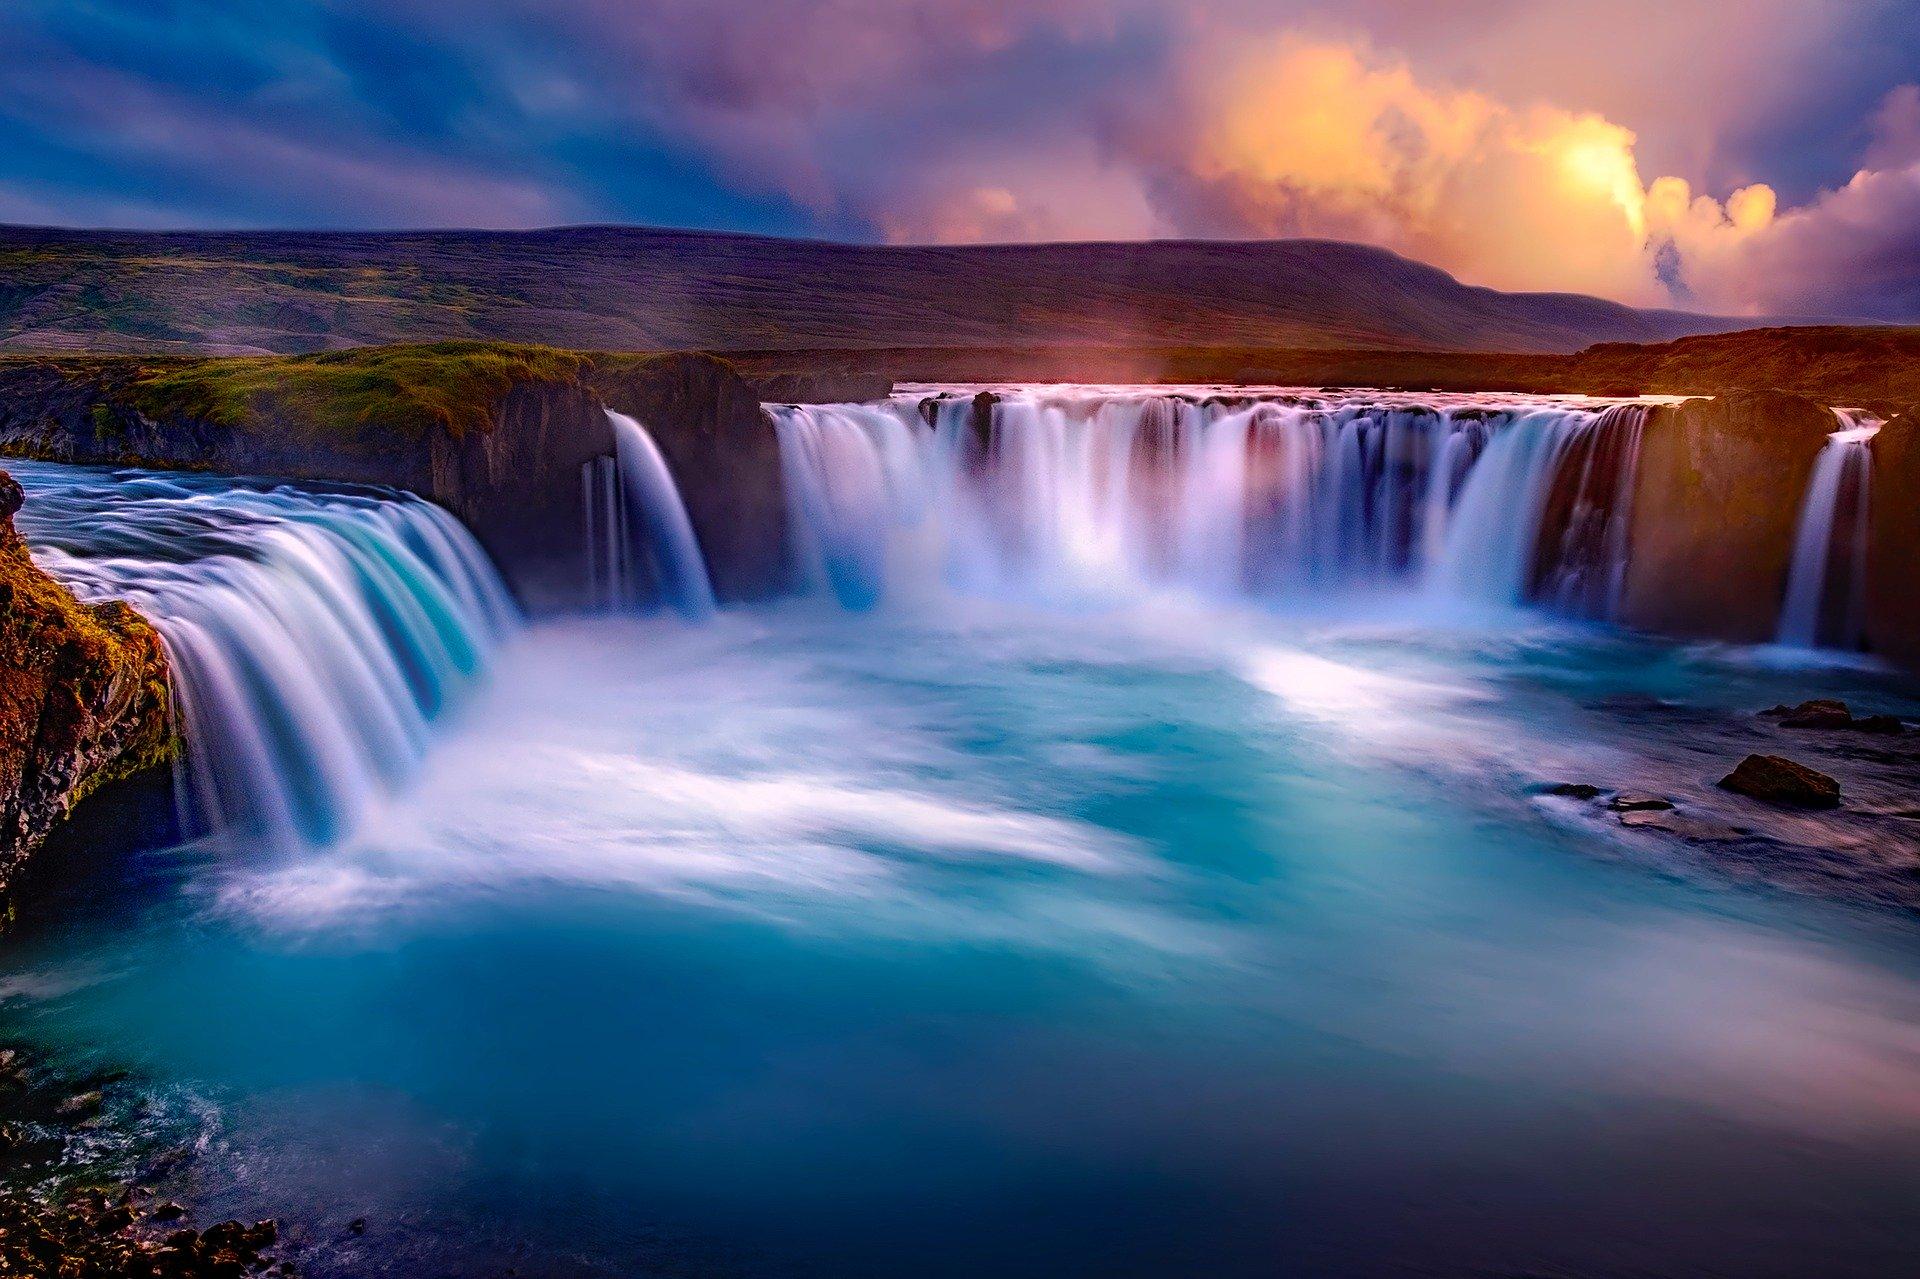 Wasserfall Modell